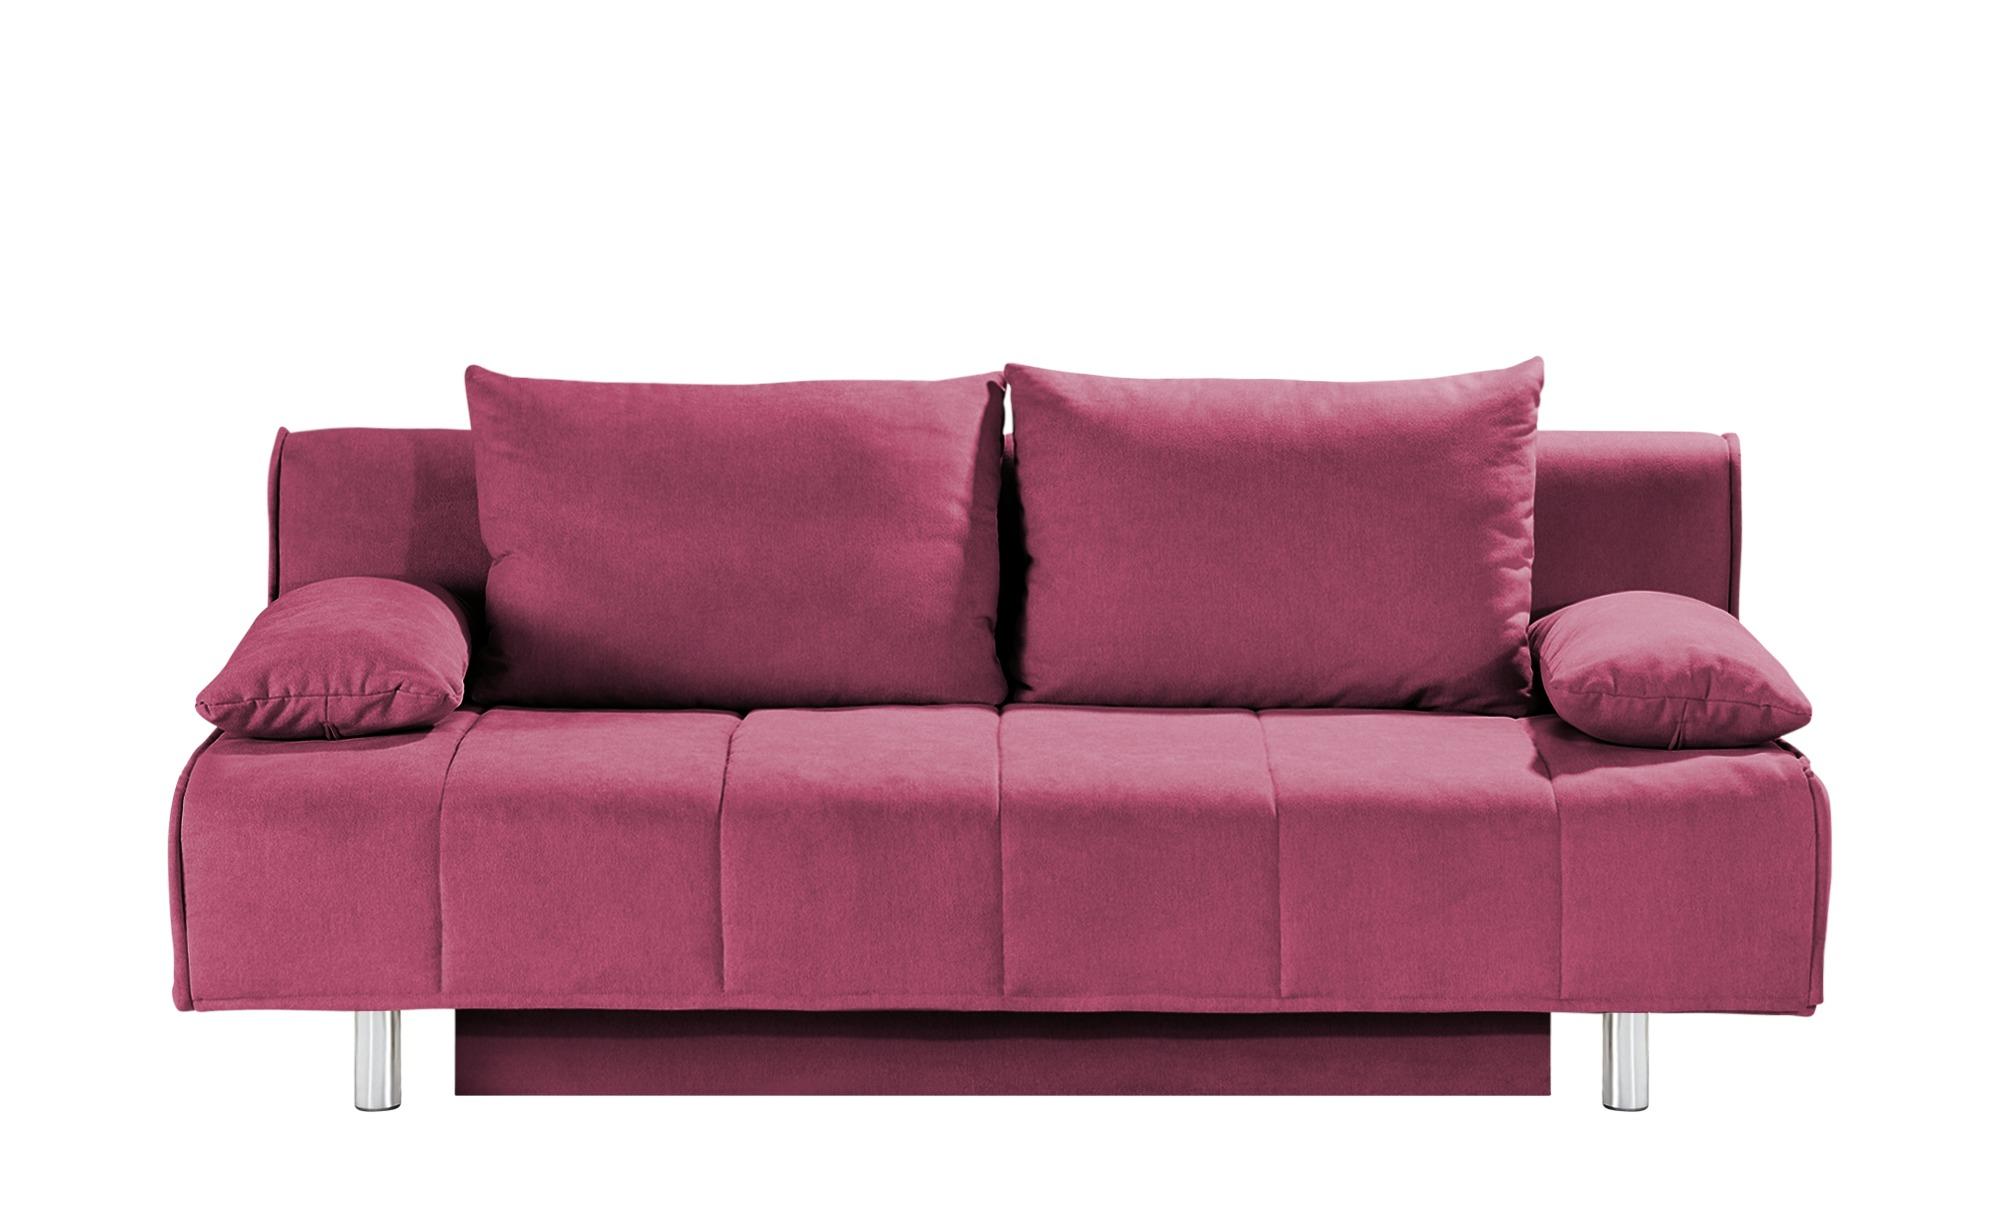 smart Schlafsofa bordeaux - Webstoff Alina ¦ rosa/pink ¦ Maße (cm): B: 200 H: 90 T: 100 Polstermöbel > Sofas > 2-Sitzer - Höffner